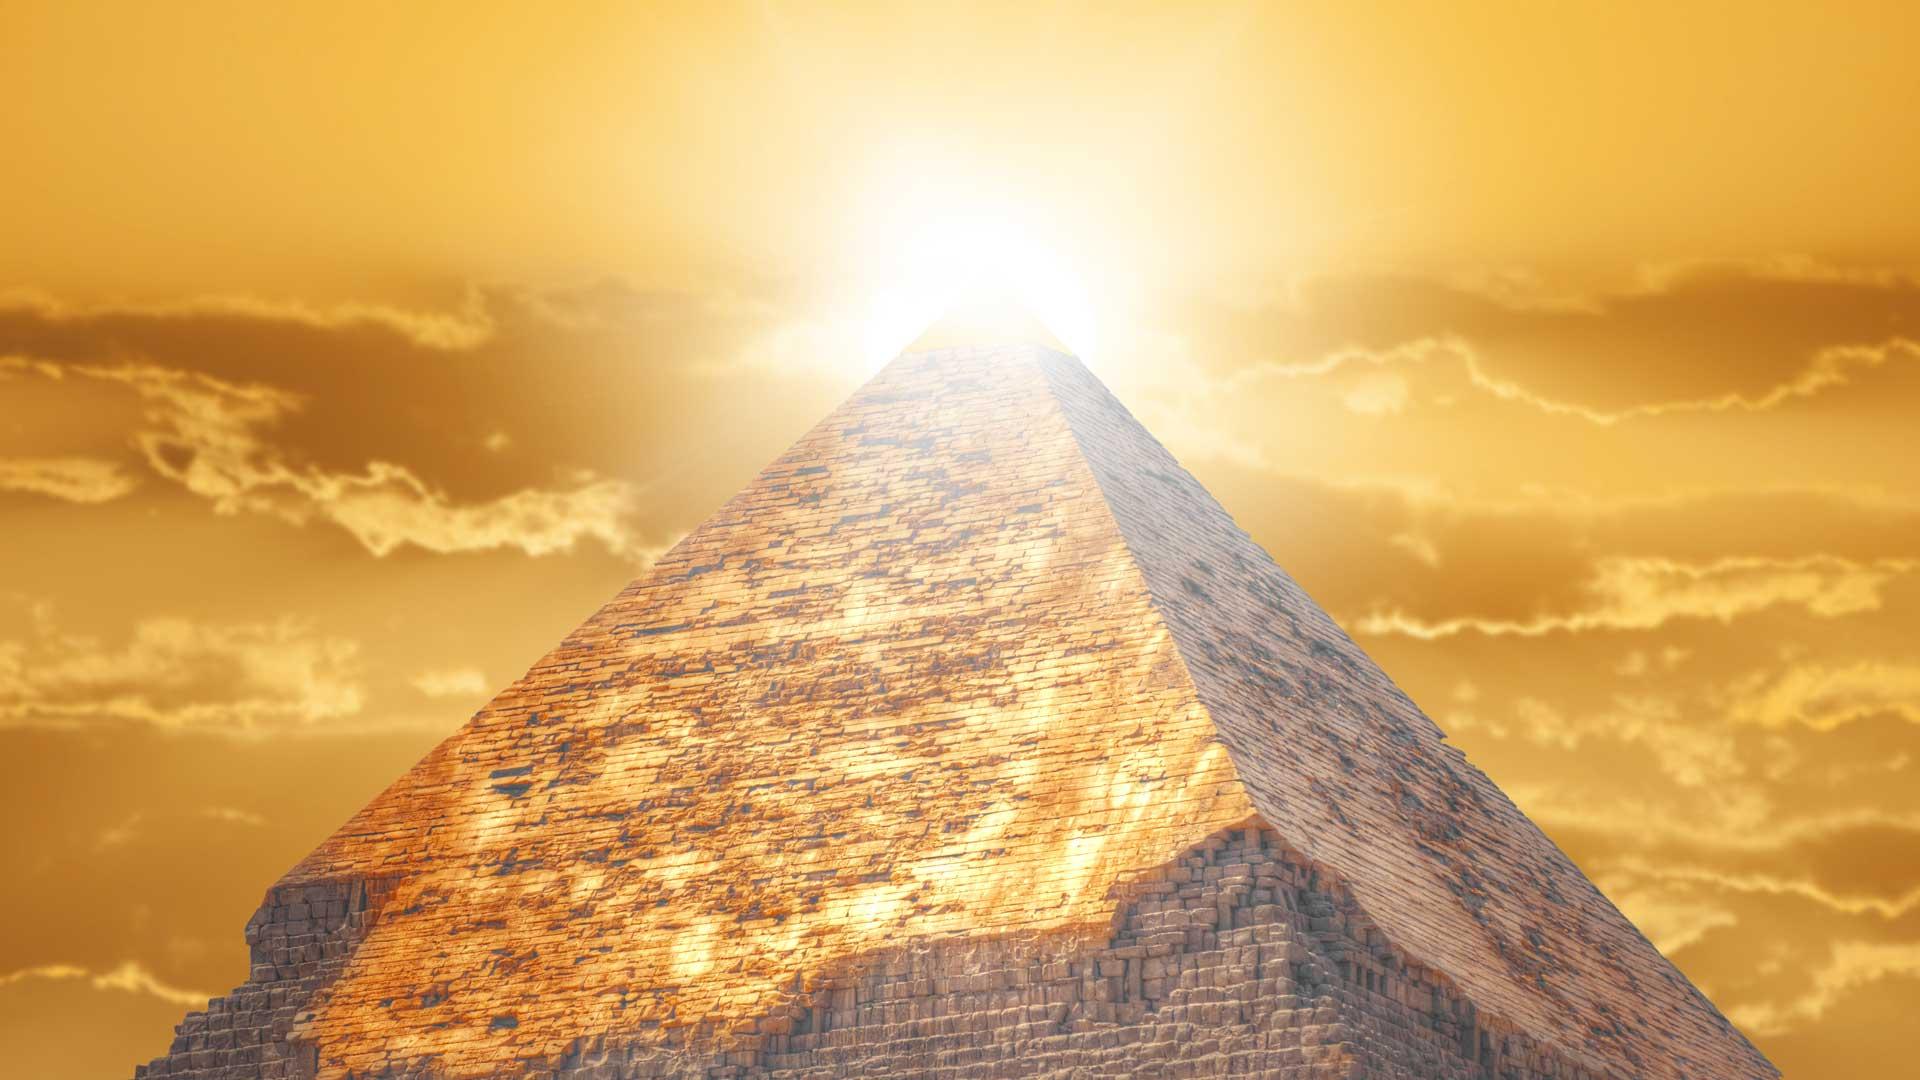 Die Pyramiden-Spitzen besaßen vergoldete Pramidions.